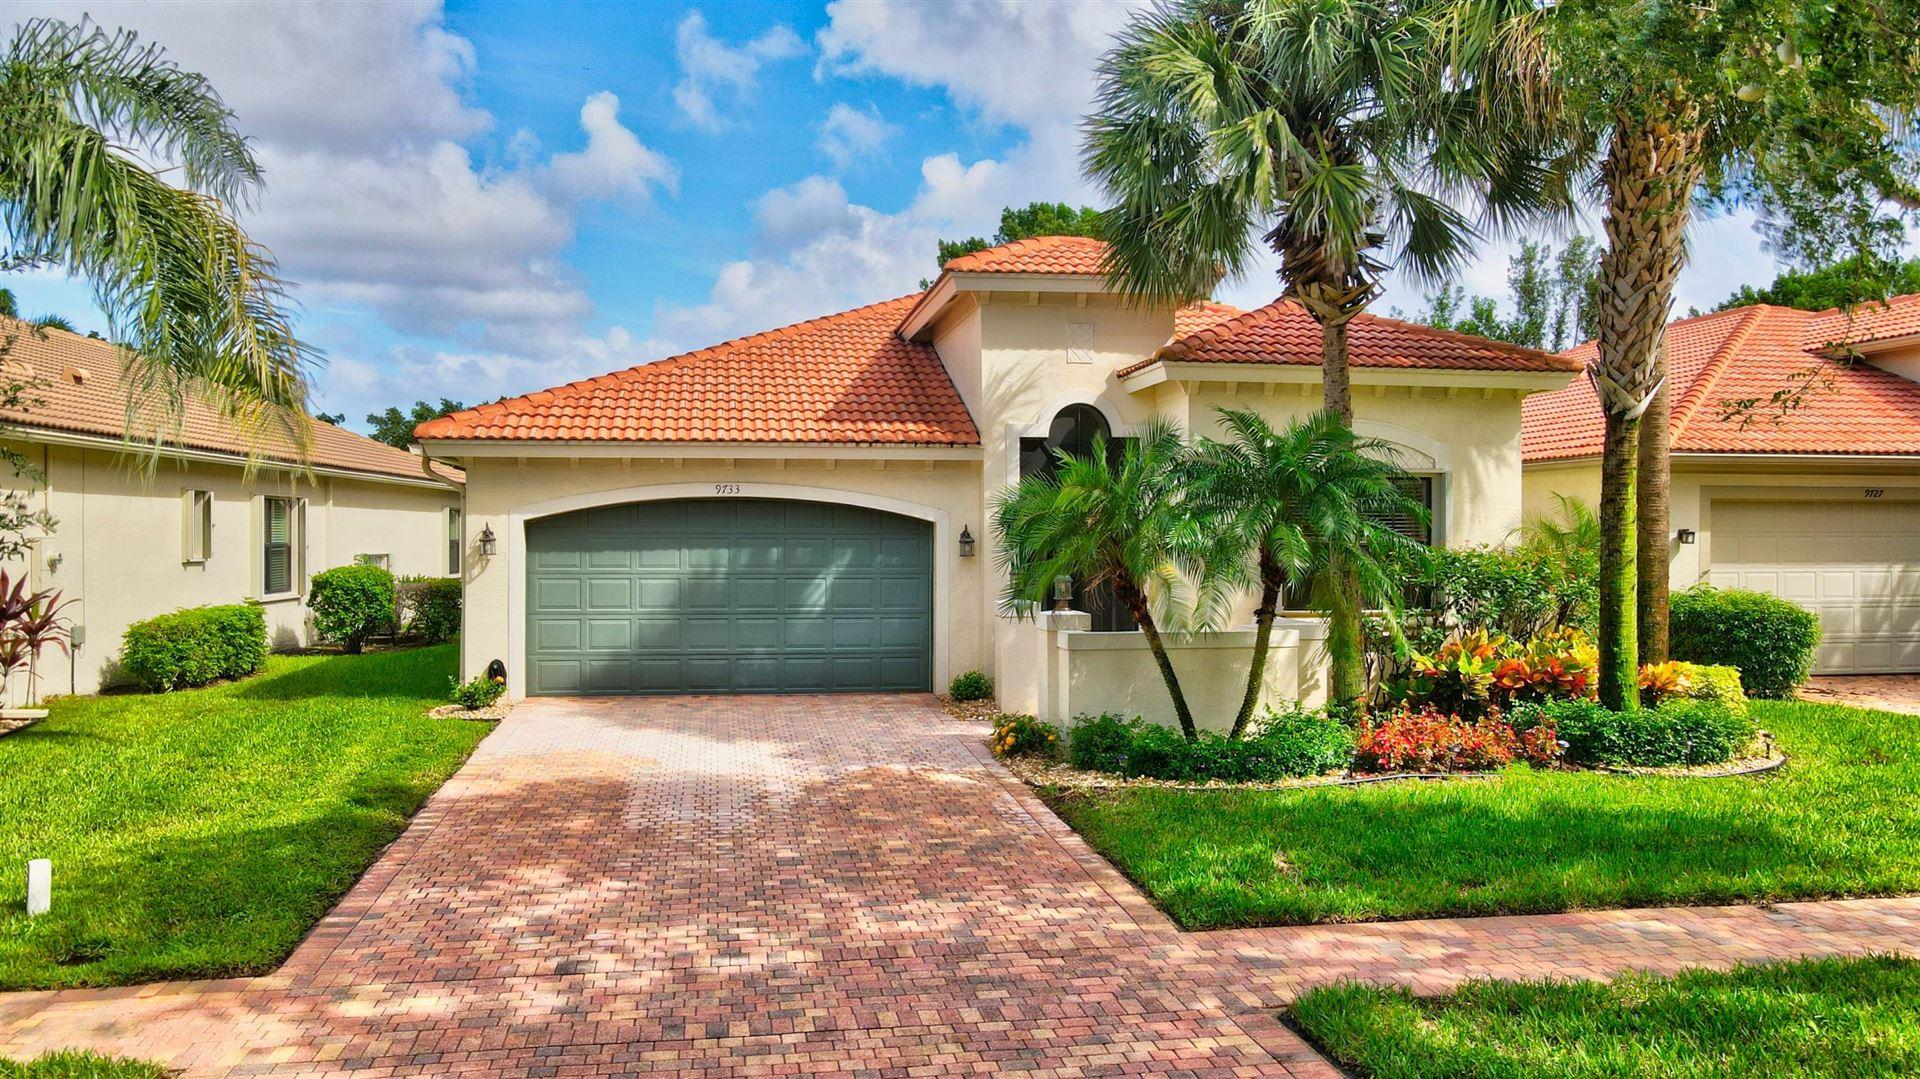 9733 Isles Cay Drive, Delray Beach, FL 33446 - #: RX-10665817